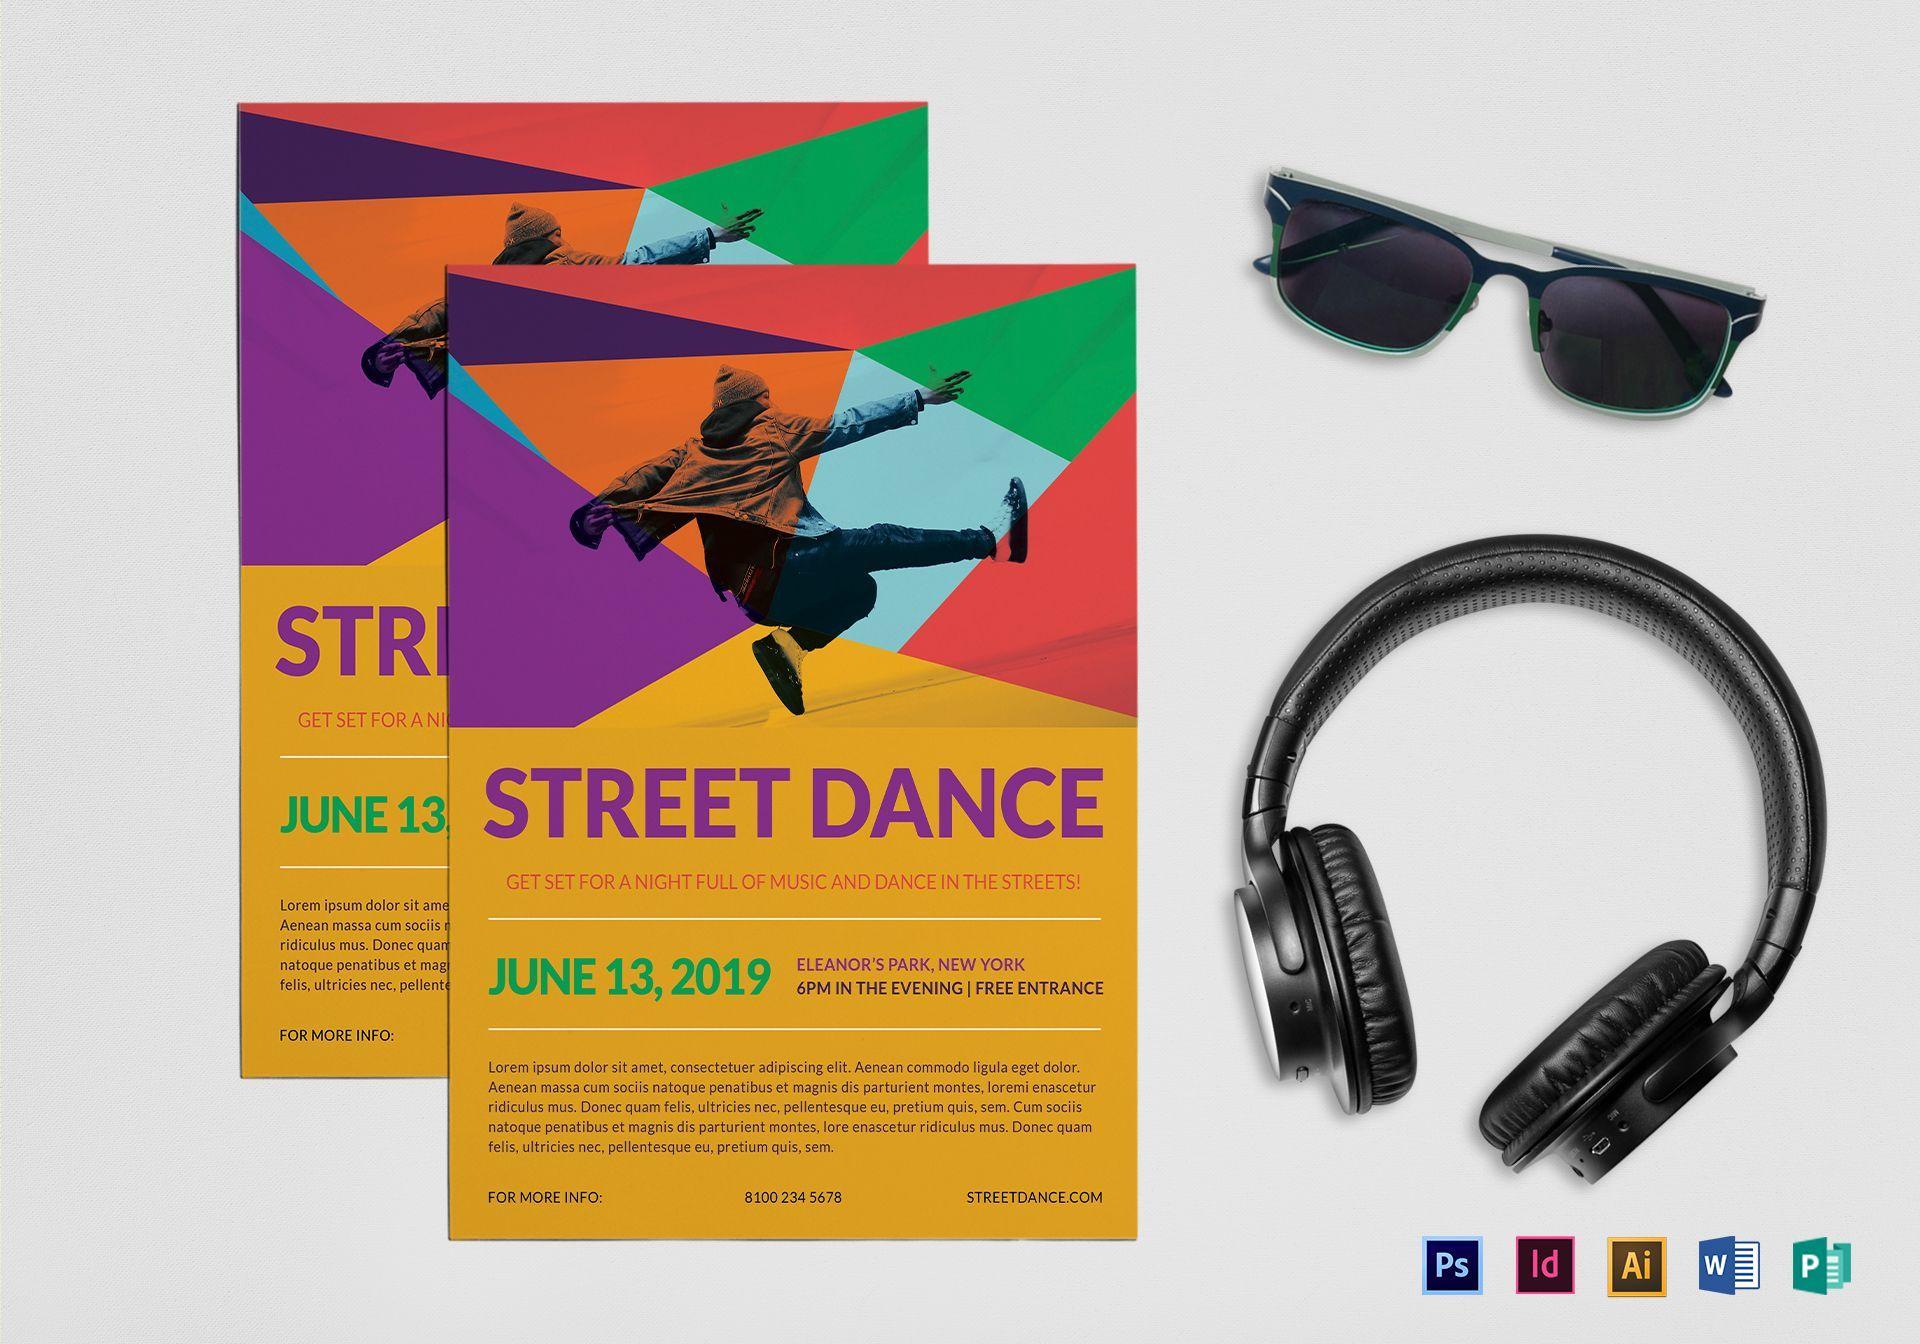 Street Dance Flyer Template Regarding Dance Flyer Template Word Cumed Org Flyer Template Street Dance Professional Templates